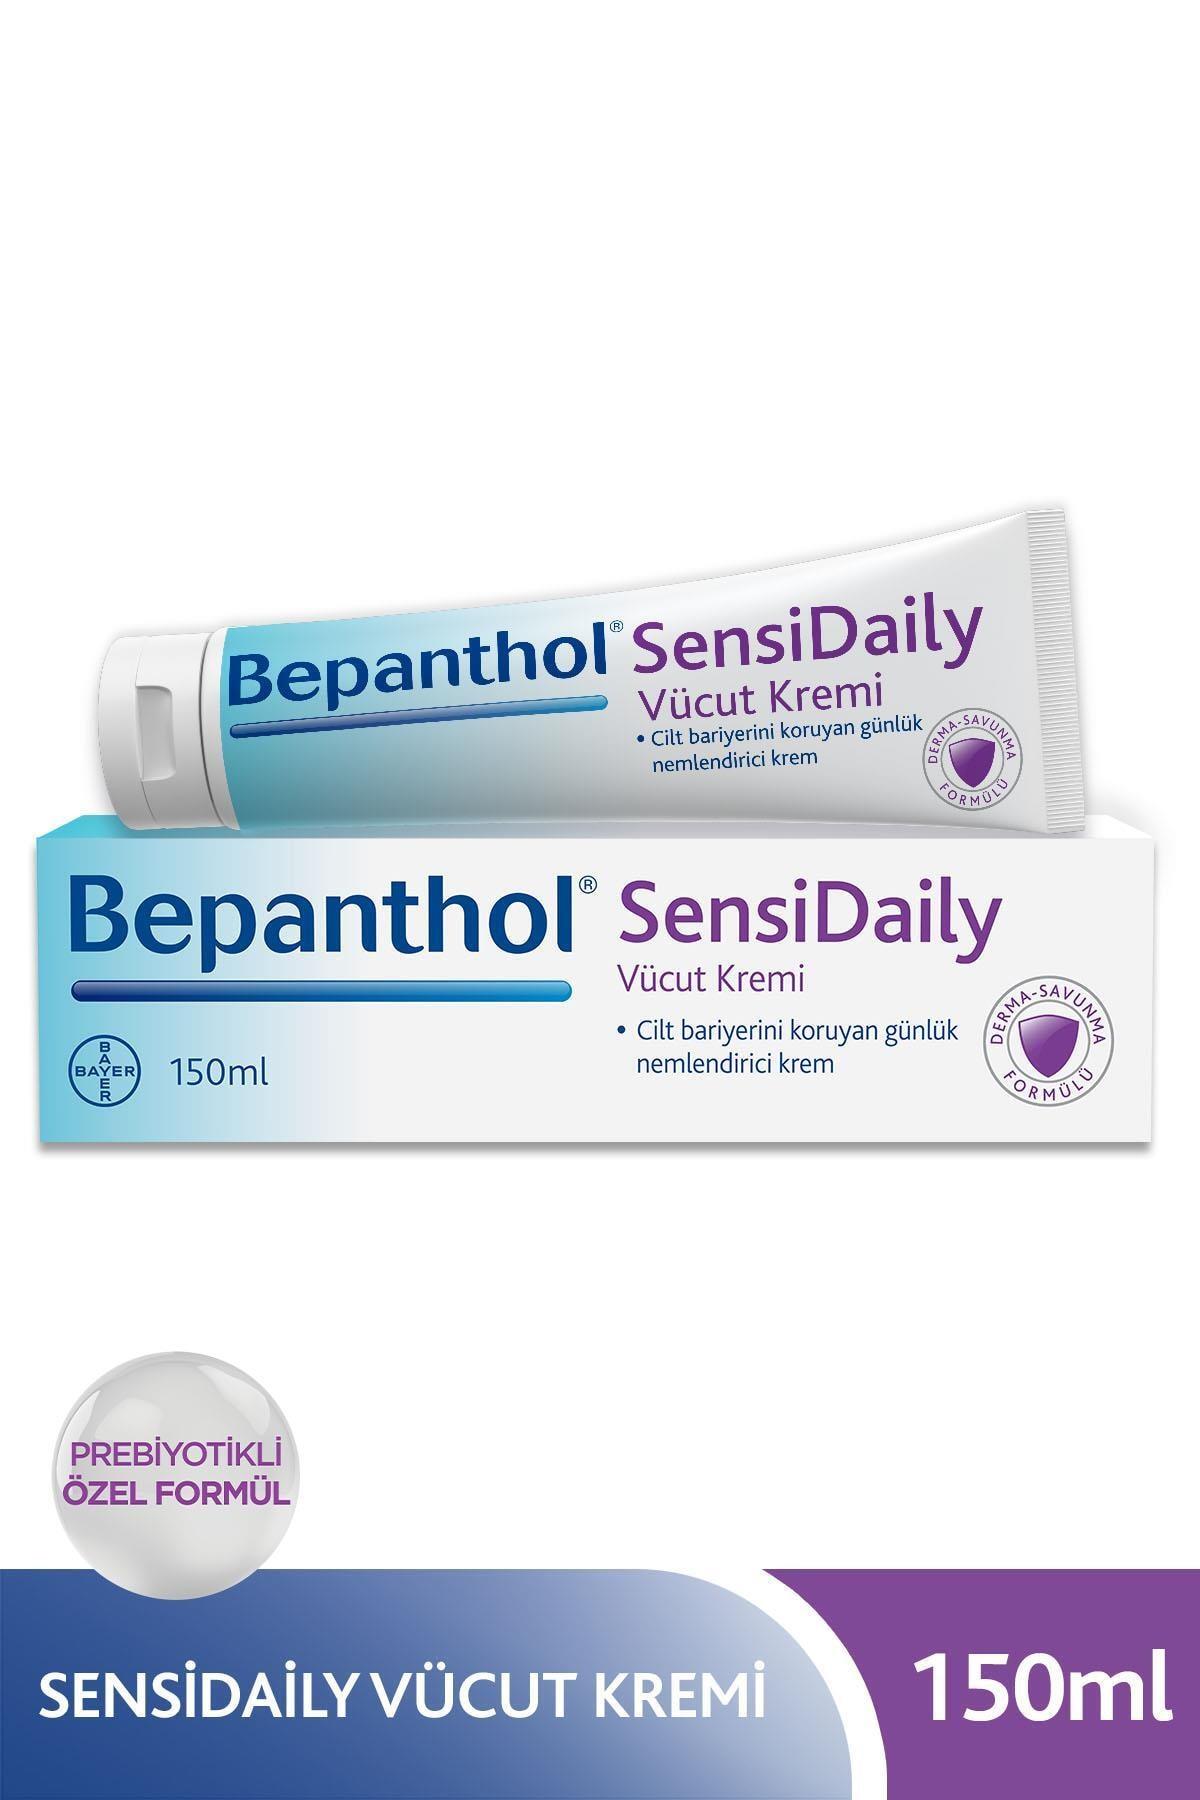 Bepanthol Sensidaily Vücut Kremi 150 ml 0